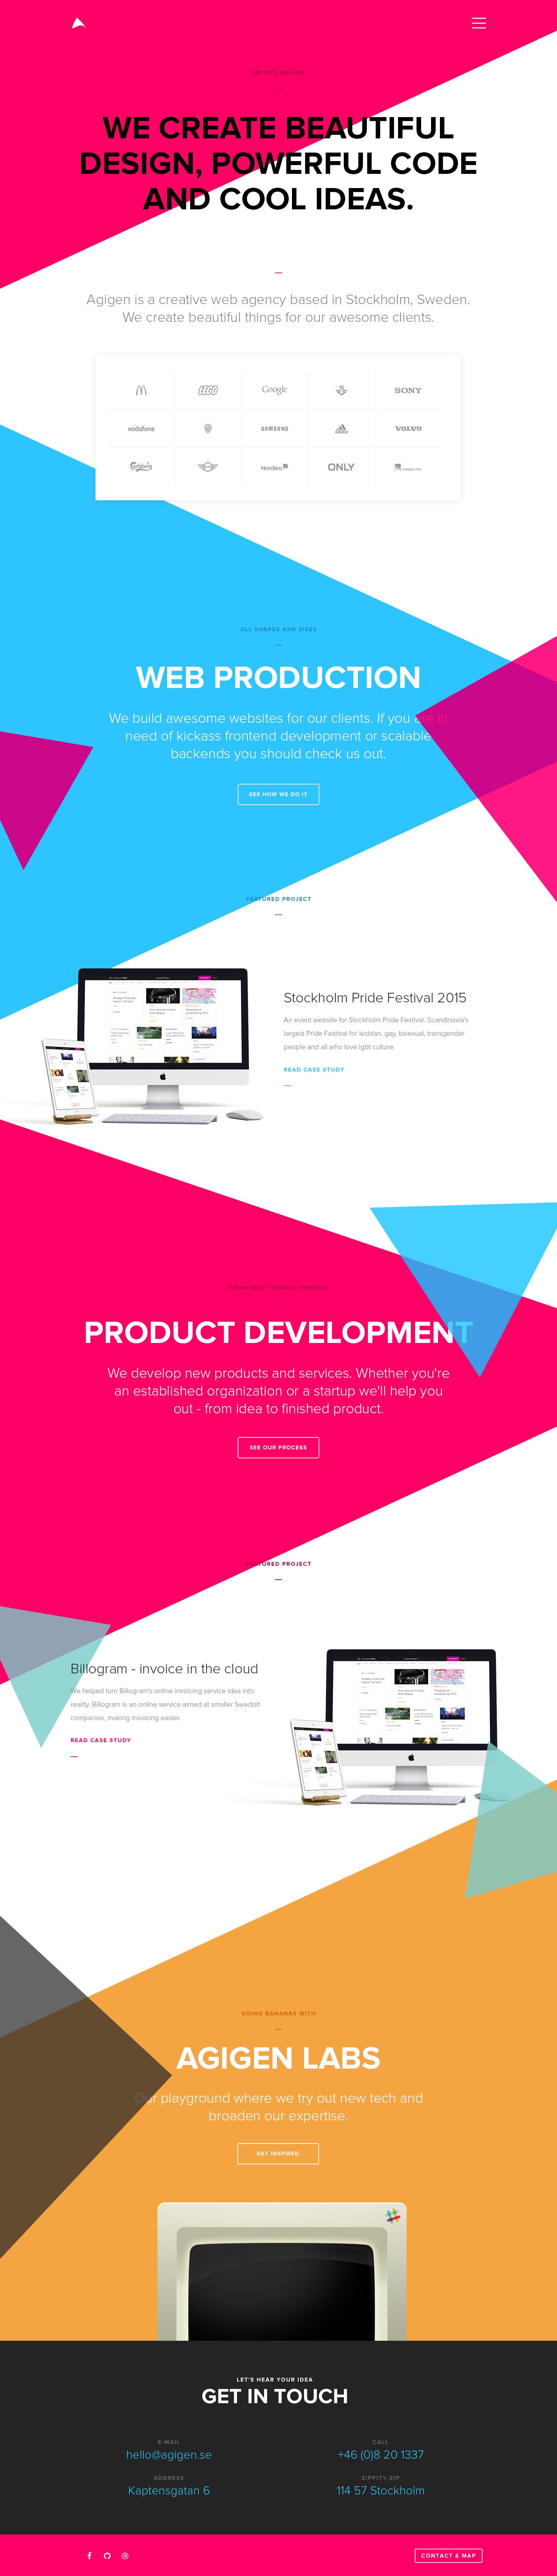 Agigen website2015 start